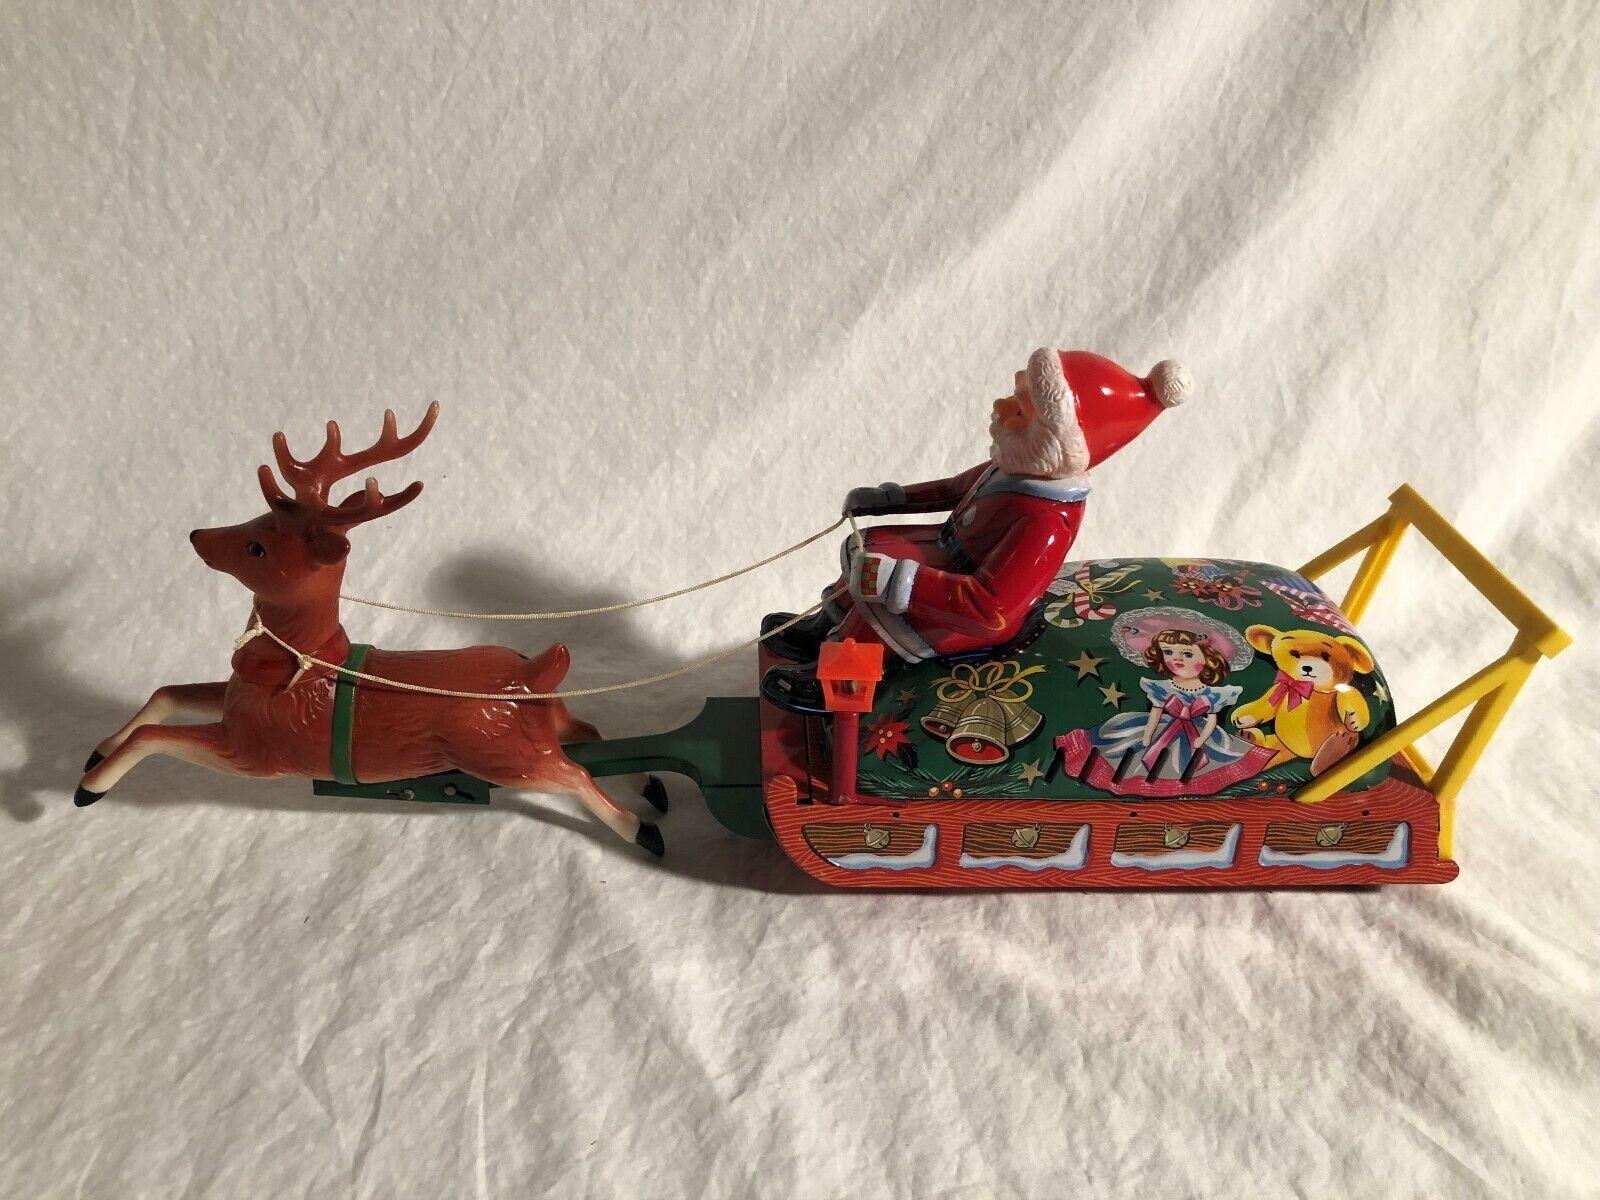 Modern Toys Japan Japan Japan LARGE Battery Operated Santa Claus On Reindeer Sleigh Box cf55d7